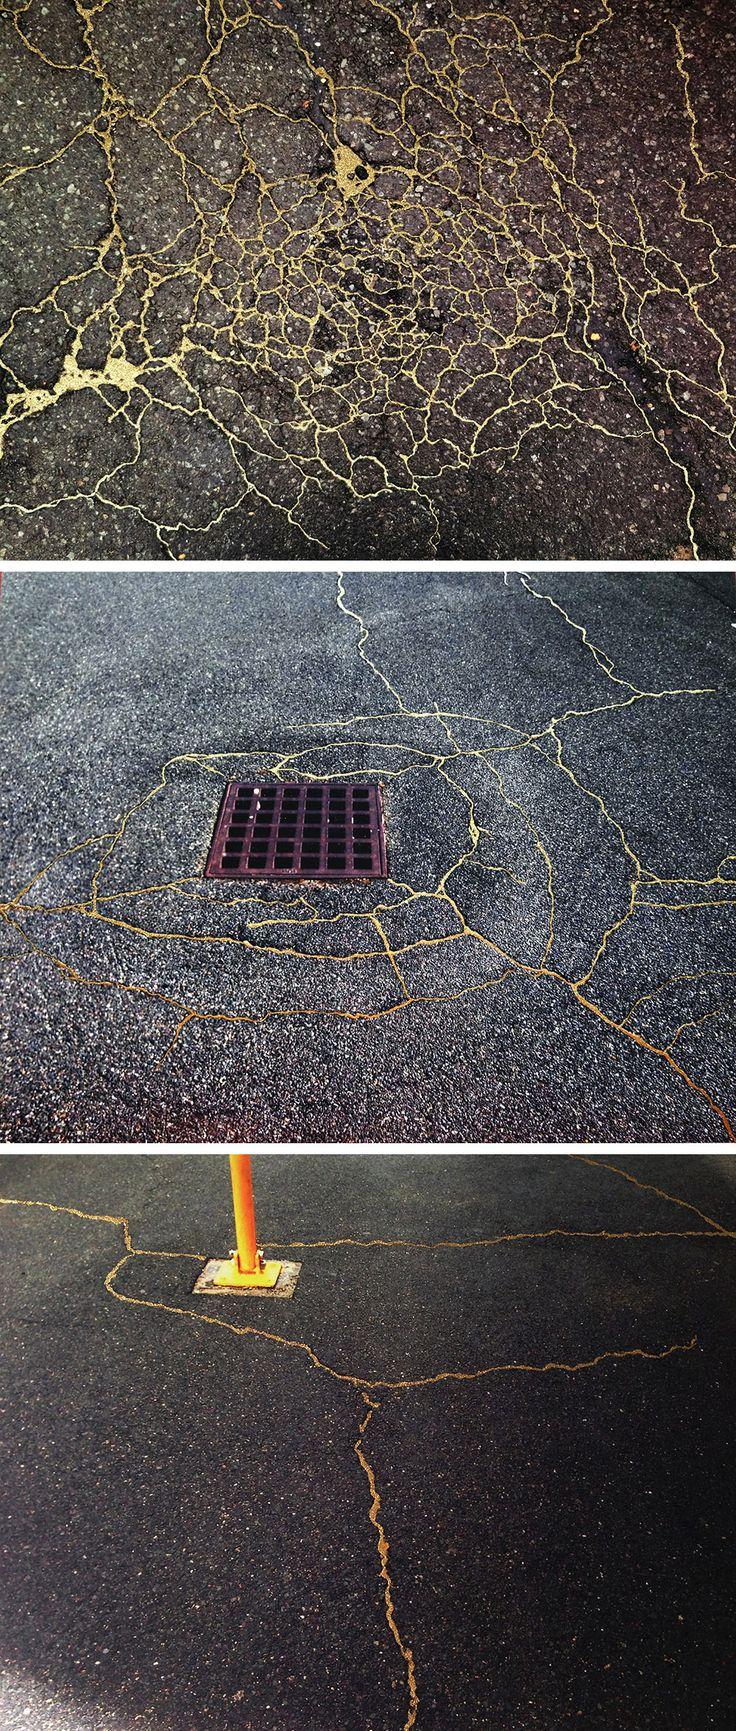 Prometheus: Hardcore kintsugi. Street Kintsugi: Artist Rachel Sussman 'Repairs' the Roads with Gold